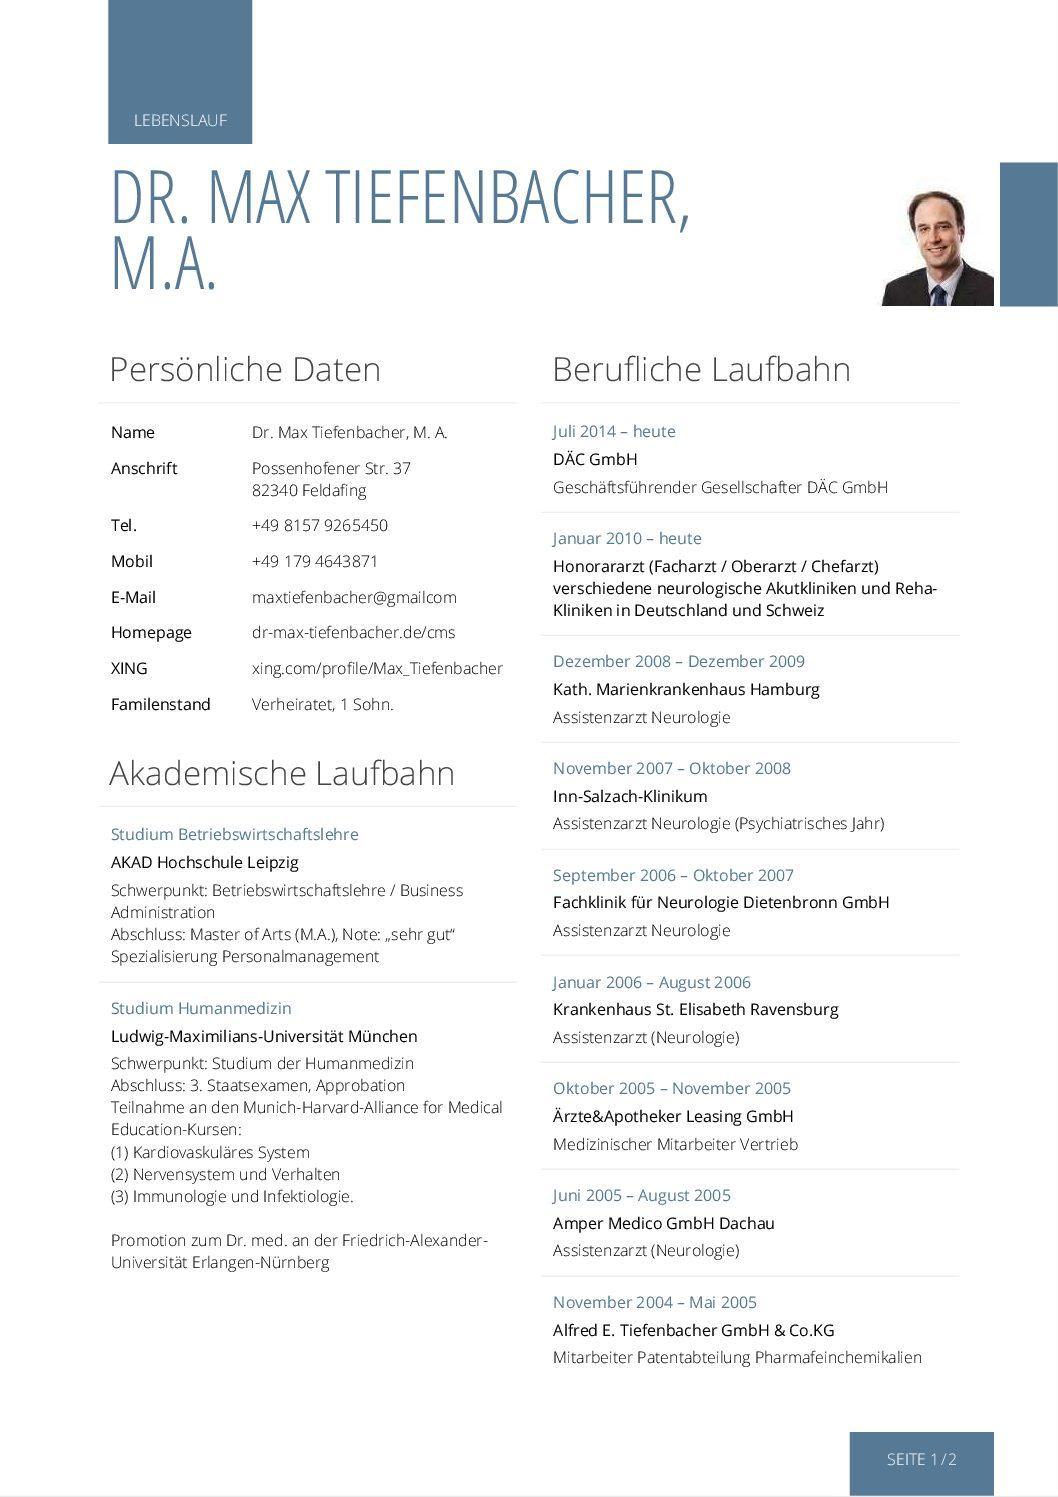 Lebenslauf Dr Max Tiefenbacher Stand 13042018 Dr Max Tiefenbacher